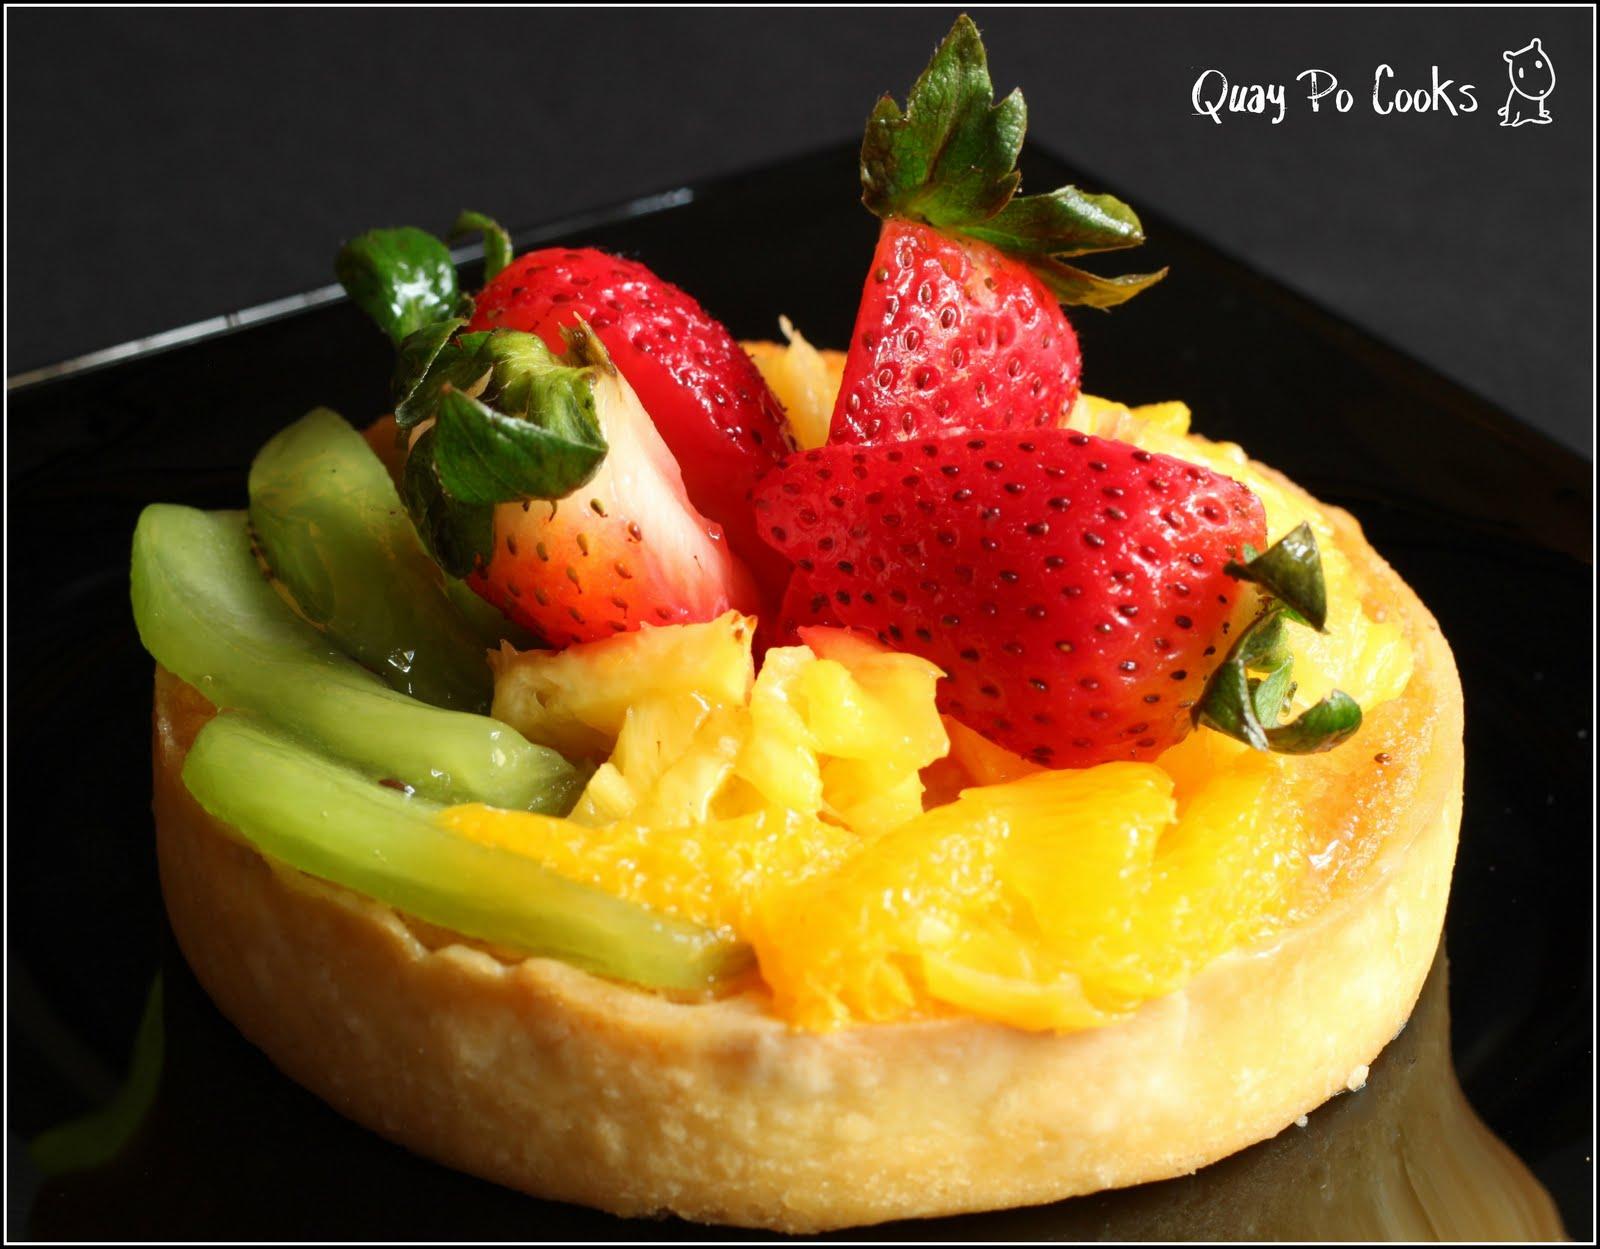 Almond cream fruit tart with orange slice, pineapple and strawberries